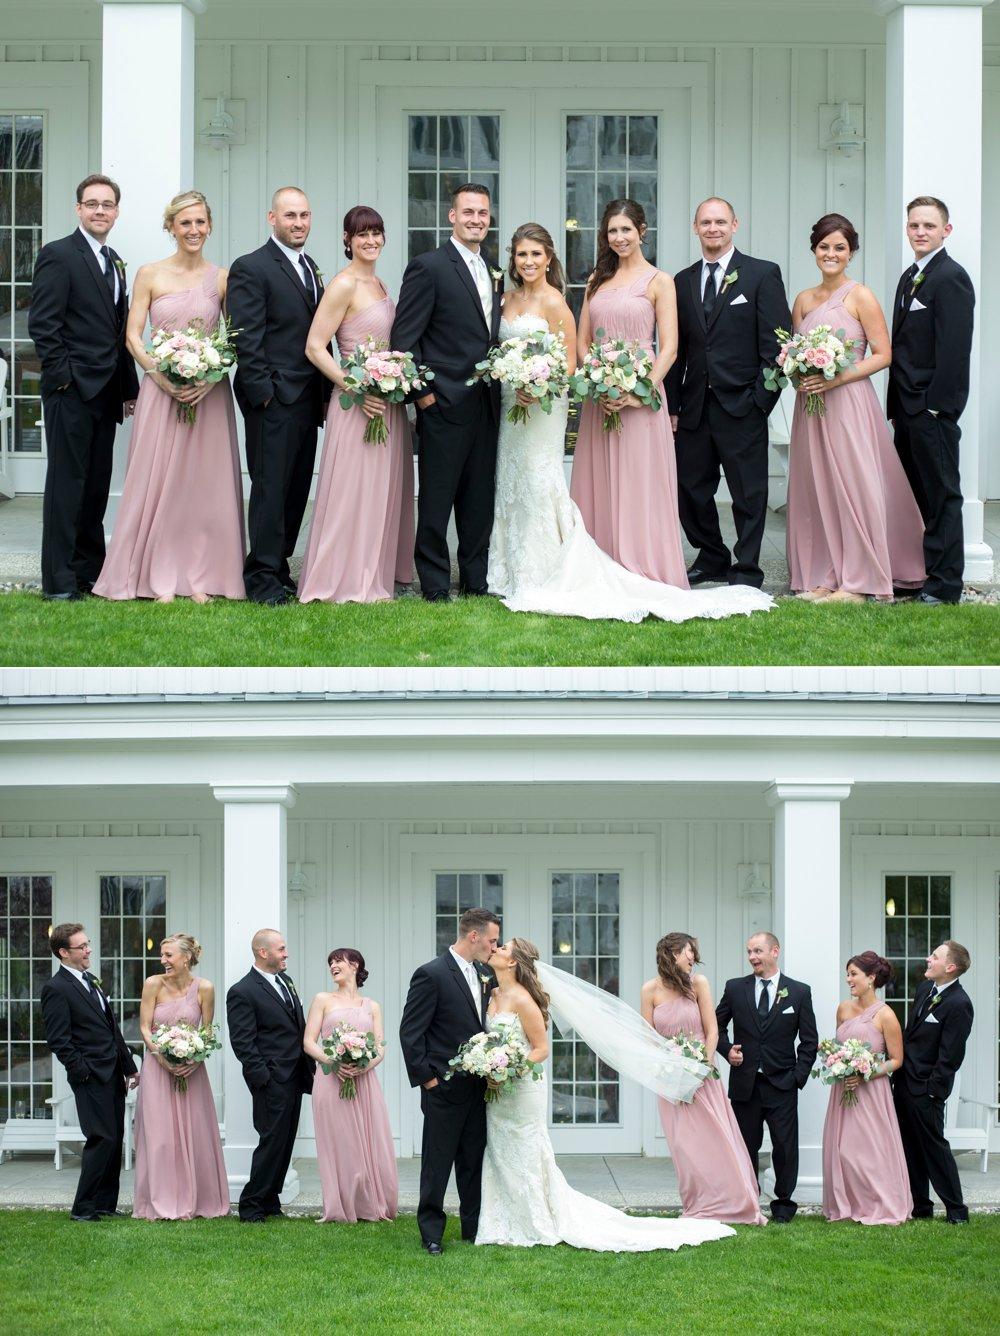 SomerbyJonesPhotography_EquinoxVermont_Wedding_0025.jpg